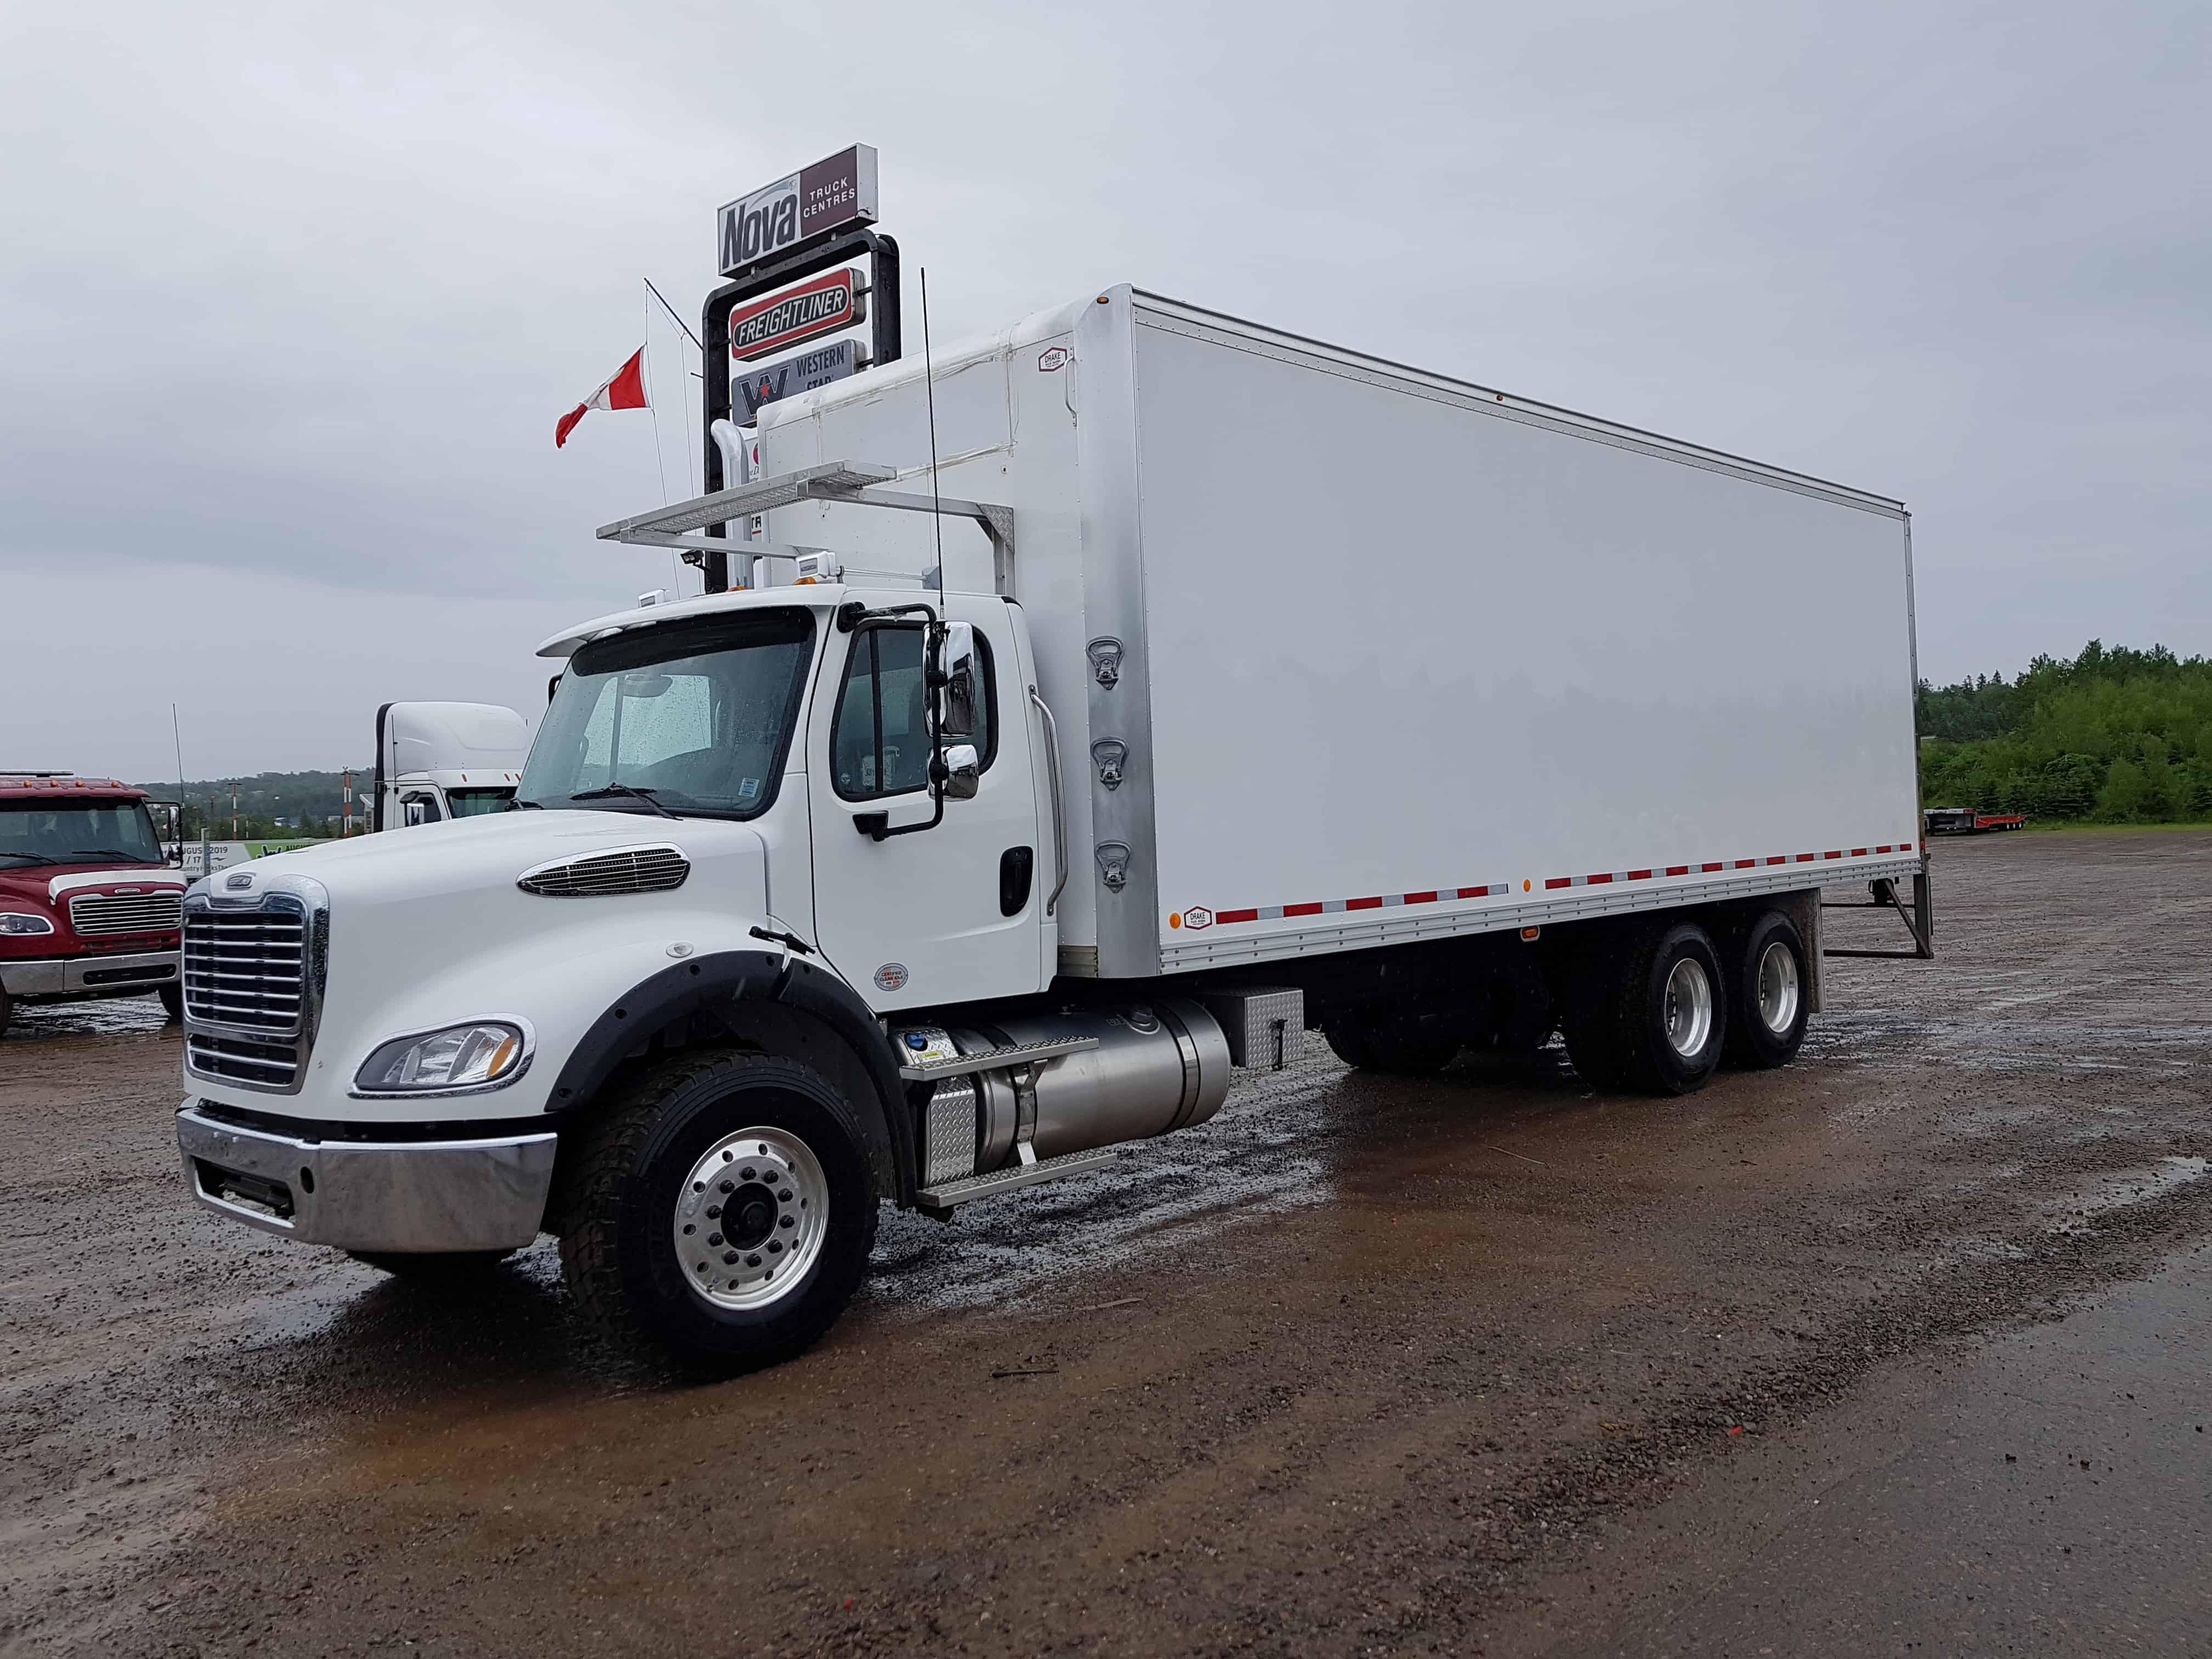 28 Foot Refer Truck | Nova Truck CentresNova Truck Centres